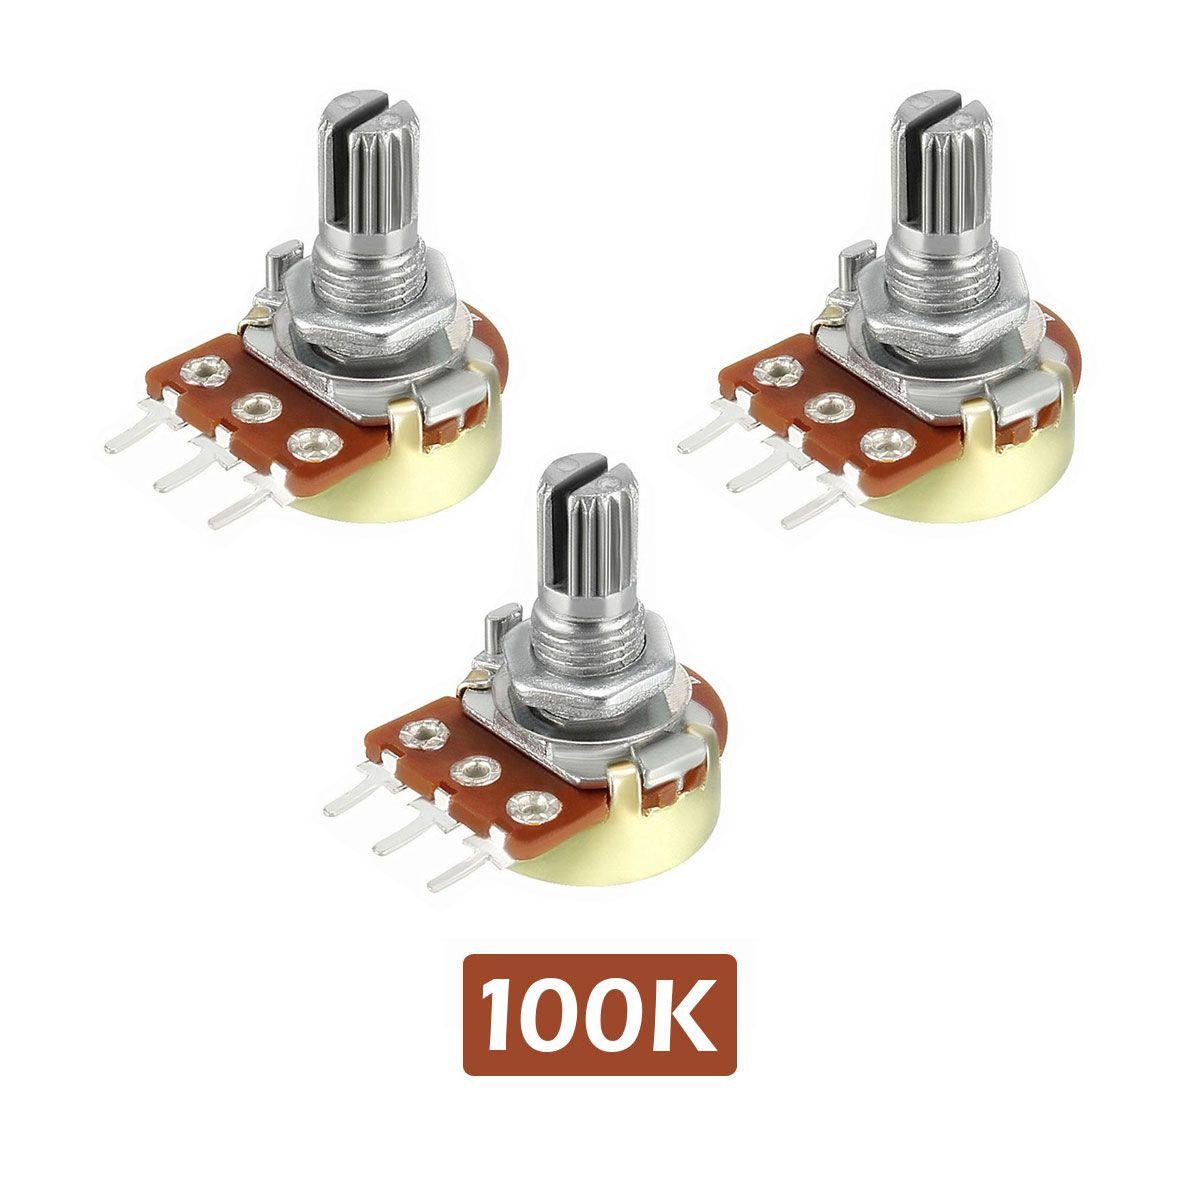 3x Potenciômetro 100k Linear Estriado 16.9mm Wh148 B100k